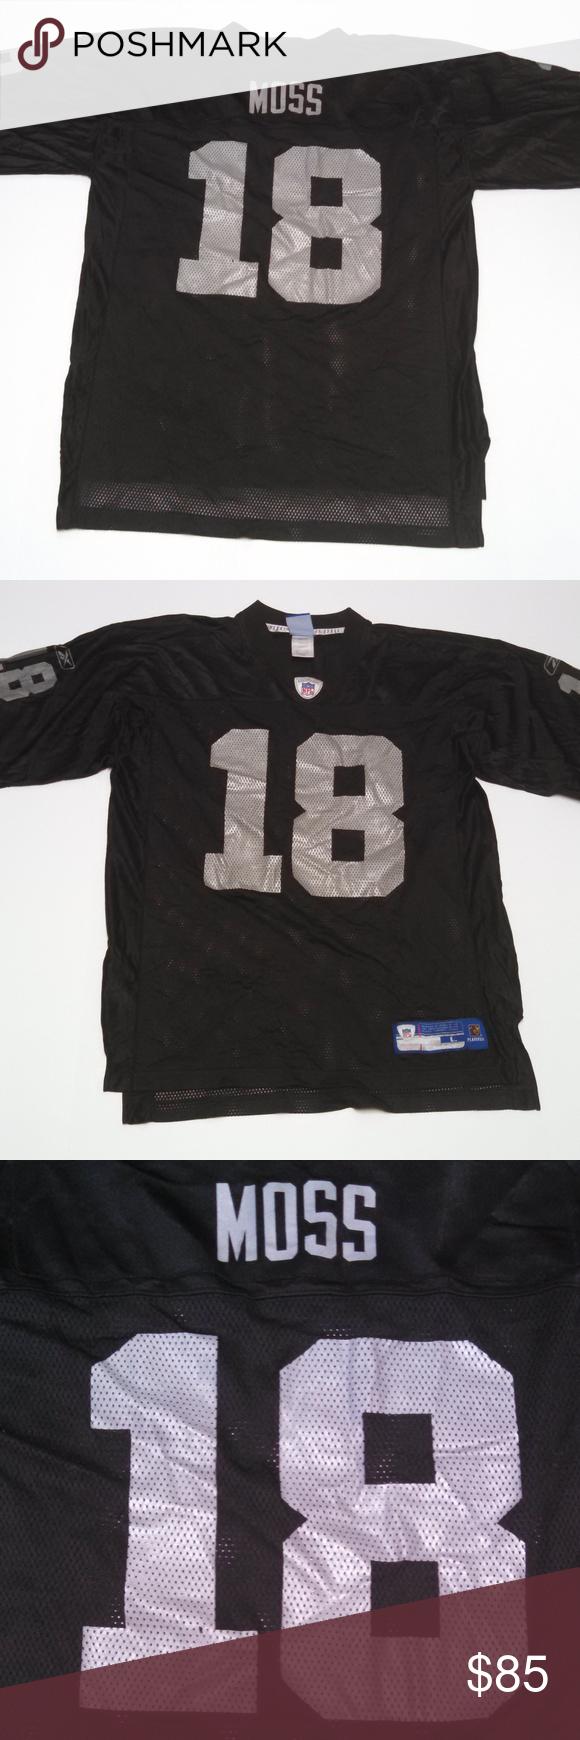 new style b467f c99de Oakland Raiders Randy Moss Jersey #18 Size Large Men's ...